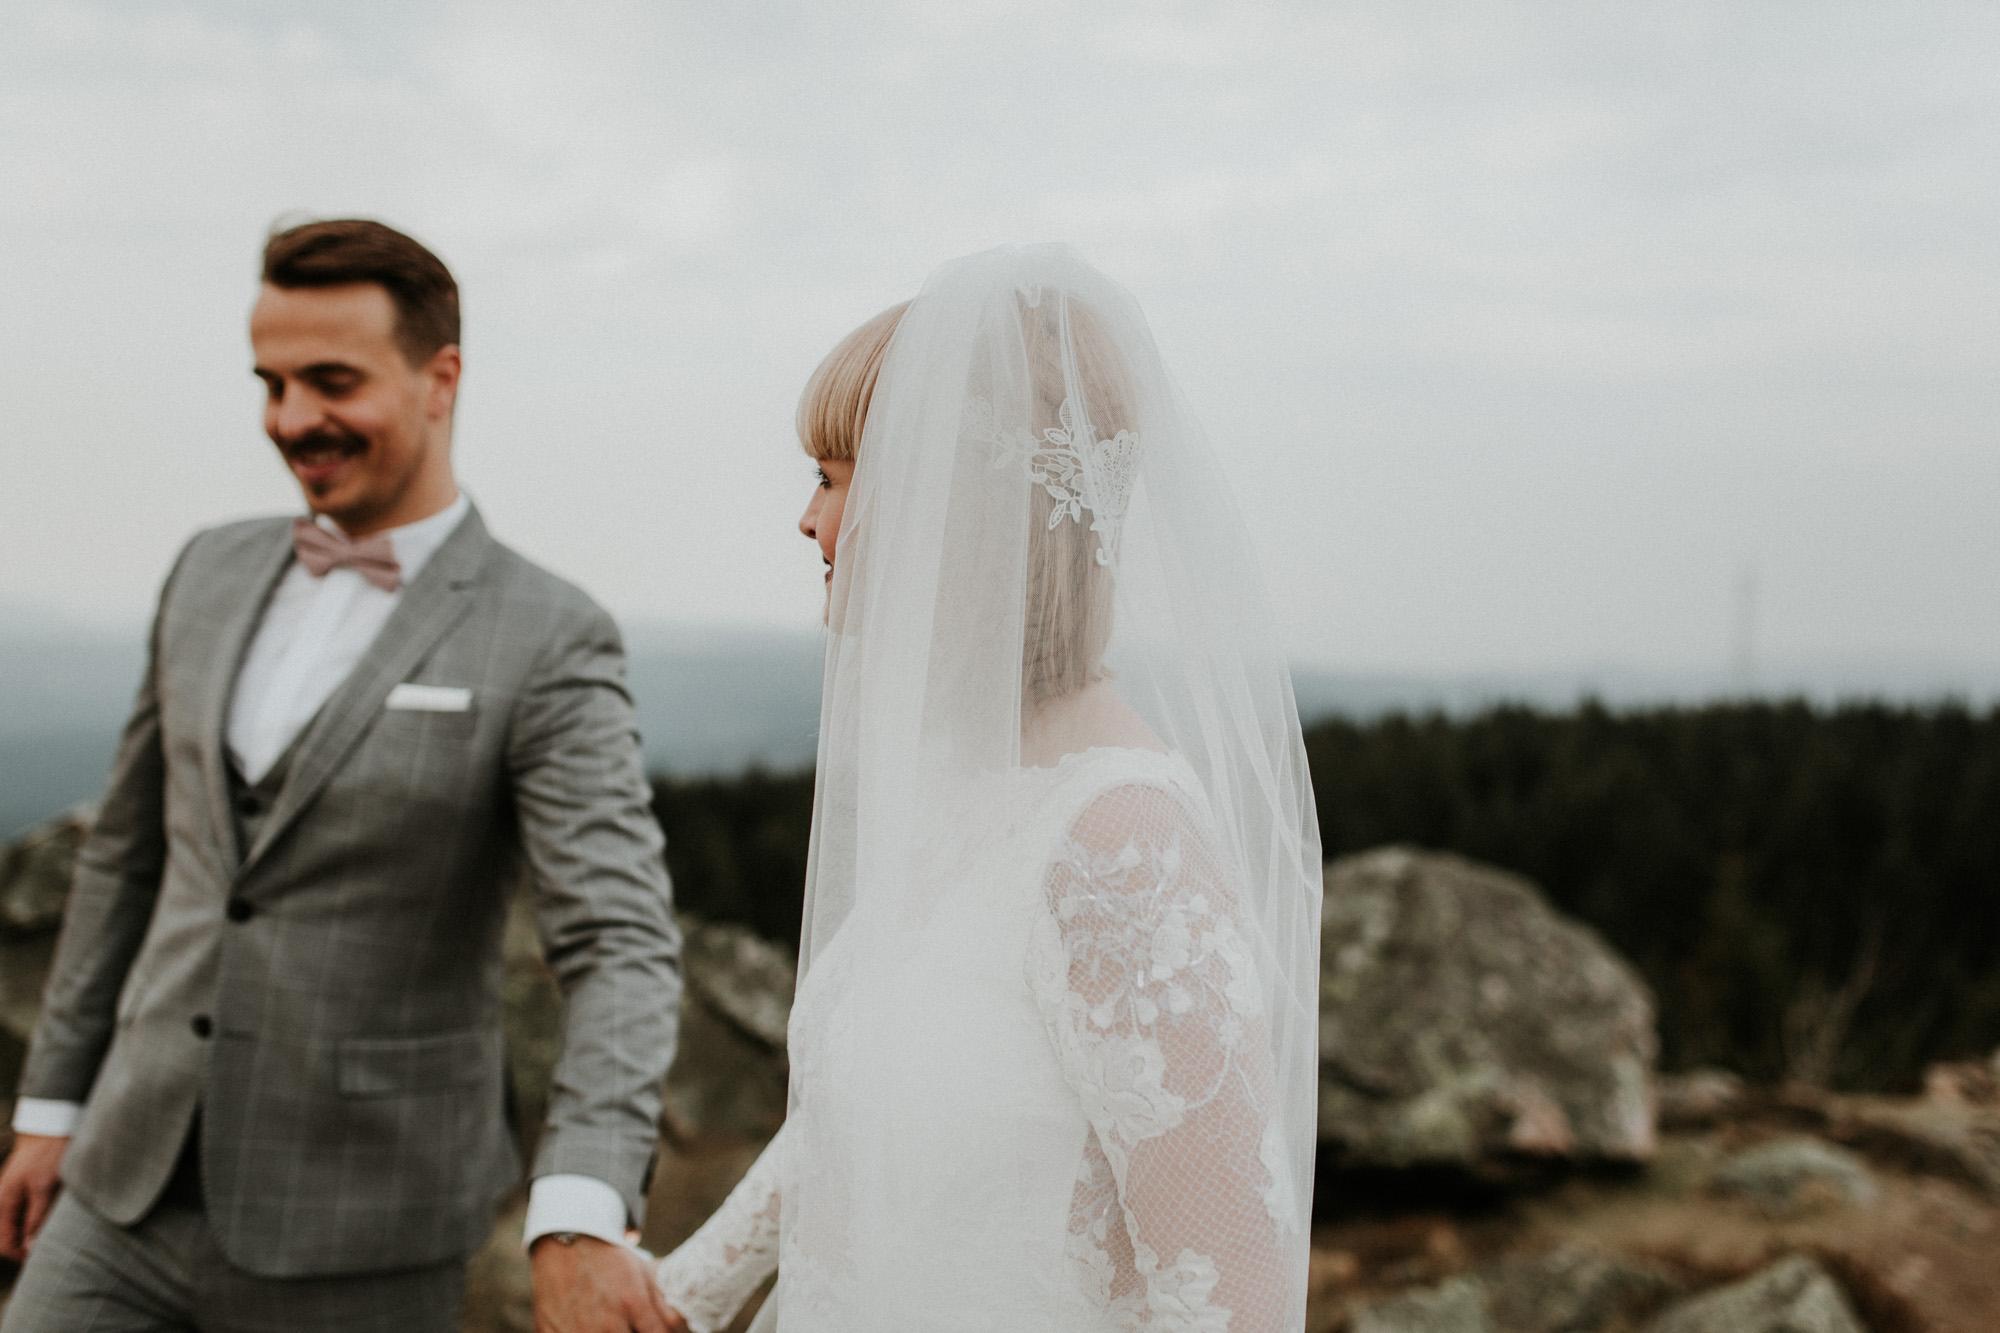 DanielaMarquardtPhotography_Hochzeitsfotograf_Düsseldorf_Köln_Mallorca_Bayern_Austria_Harz_LinaundMaik_Afterwedding-Shooting_Weddingphotographer_Ibiza_Tuskany_Italien_Toskana6